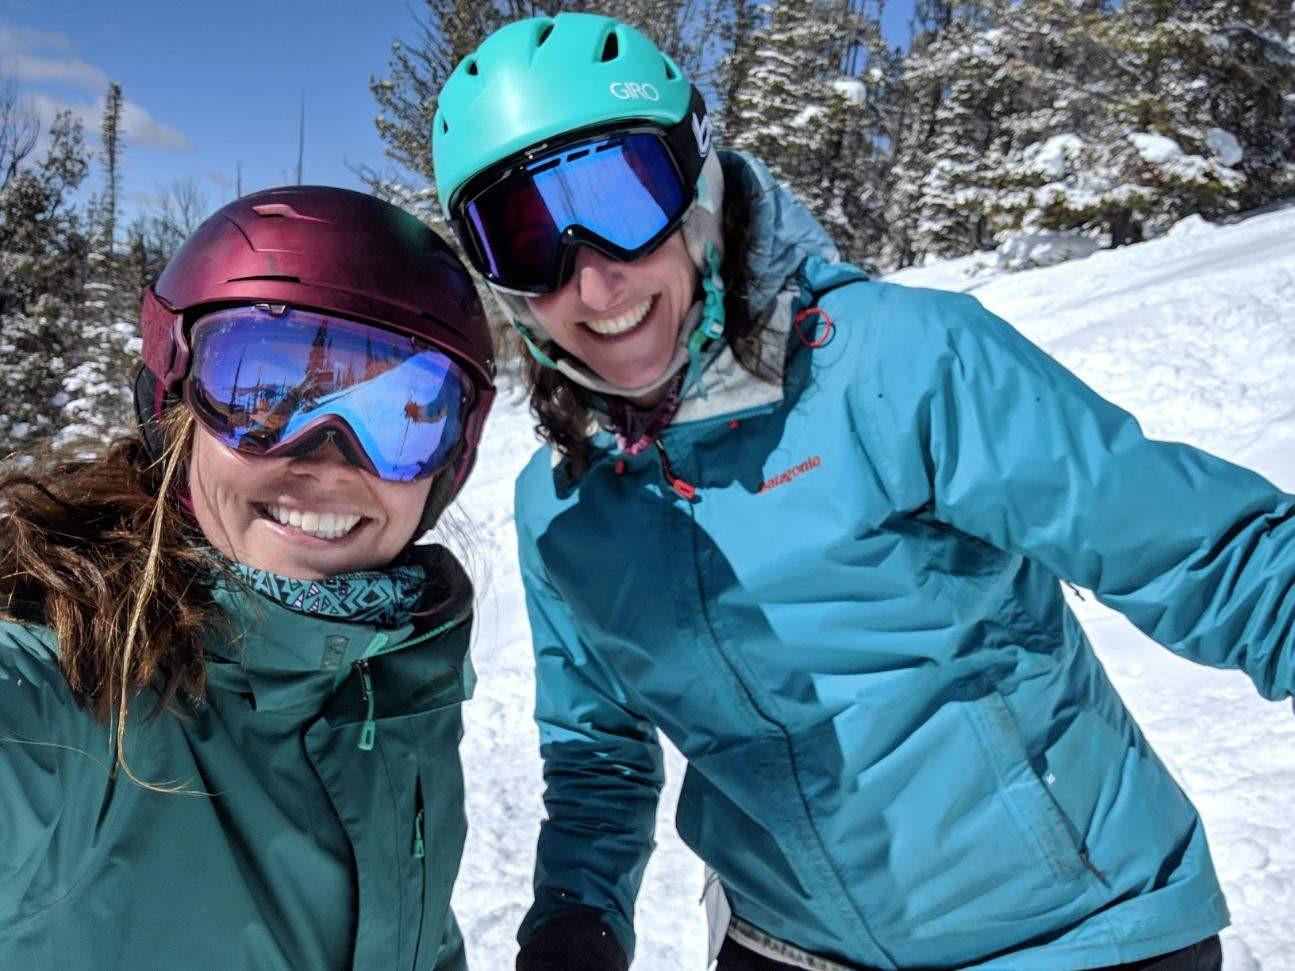 GYC's Wildlife Program Associate Brooke Shifrin (left) and Montana Conservation Coordinator Darcie Warden shred the slopes at Maverick Mountain. (Photo GYC.)